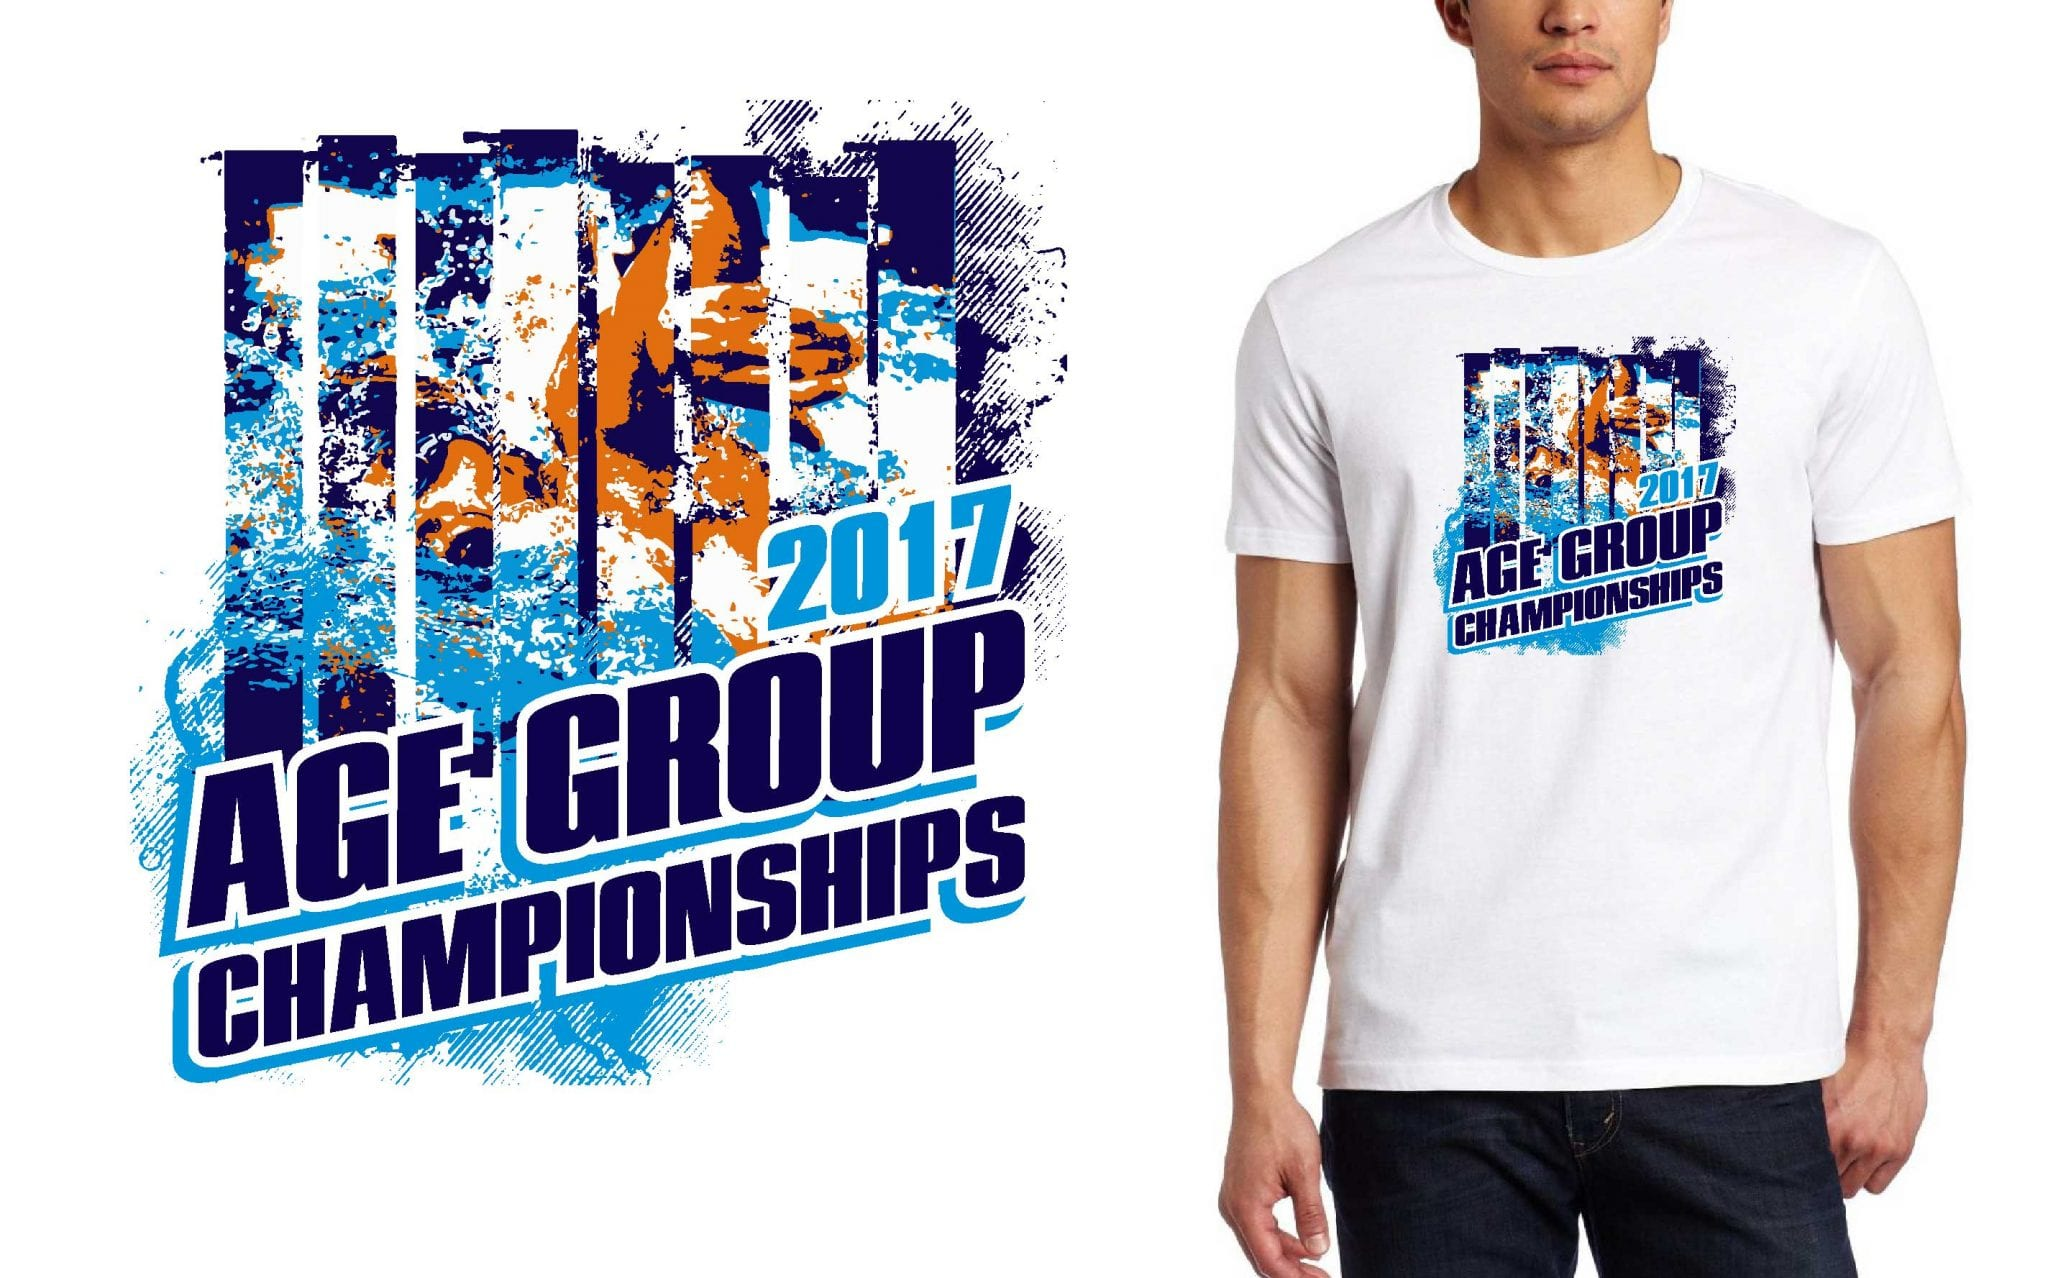 SWIMMING LOGO for NAge-Group-Championships T-SHIRT UrArtStudio